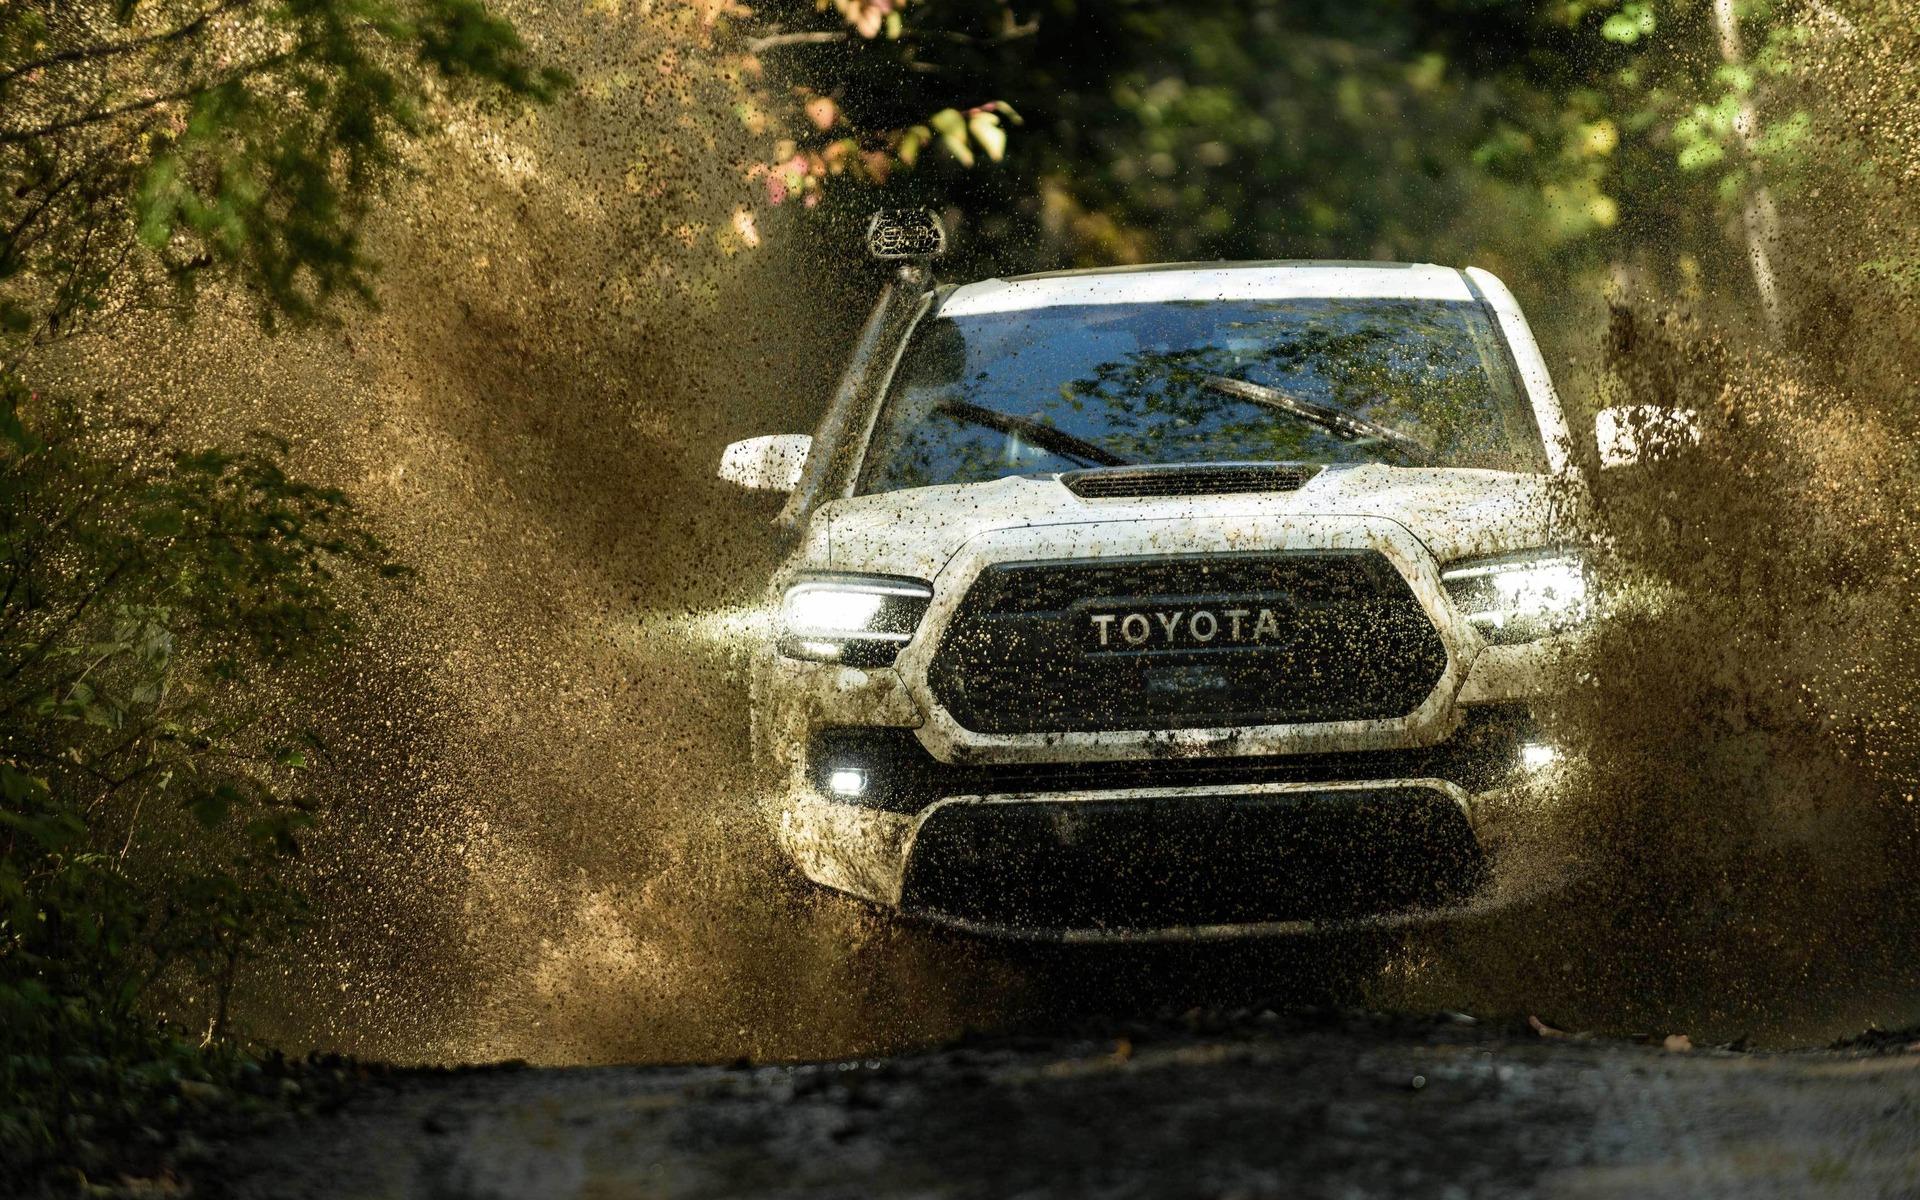 Le Toyota Tacoma 2020 introduit au Salon de l'auto de Chicago 366353_2020_Toyota_Tacoma